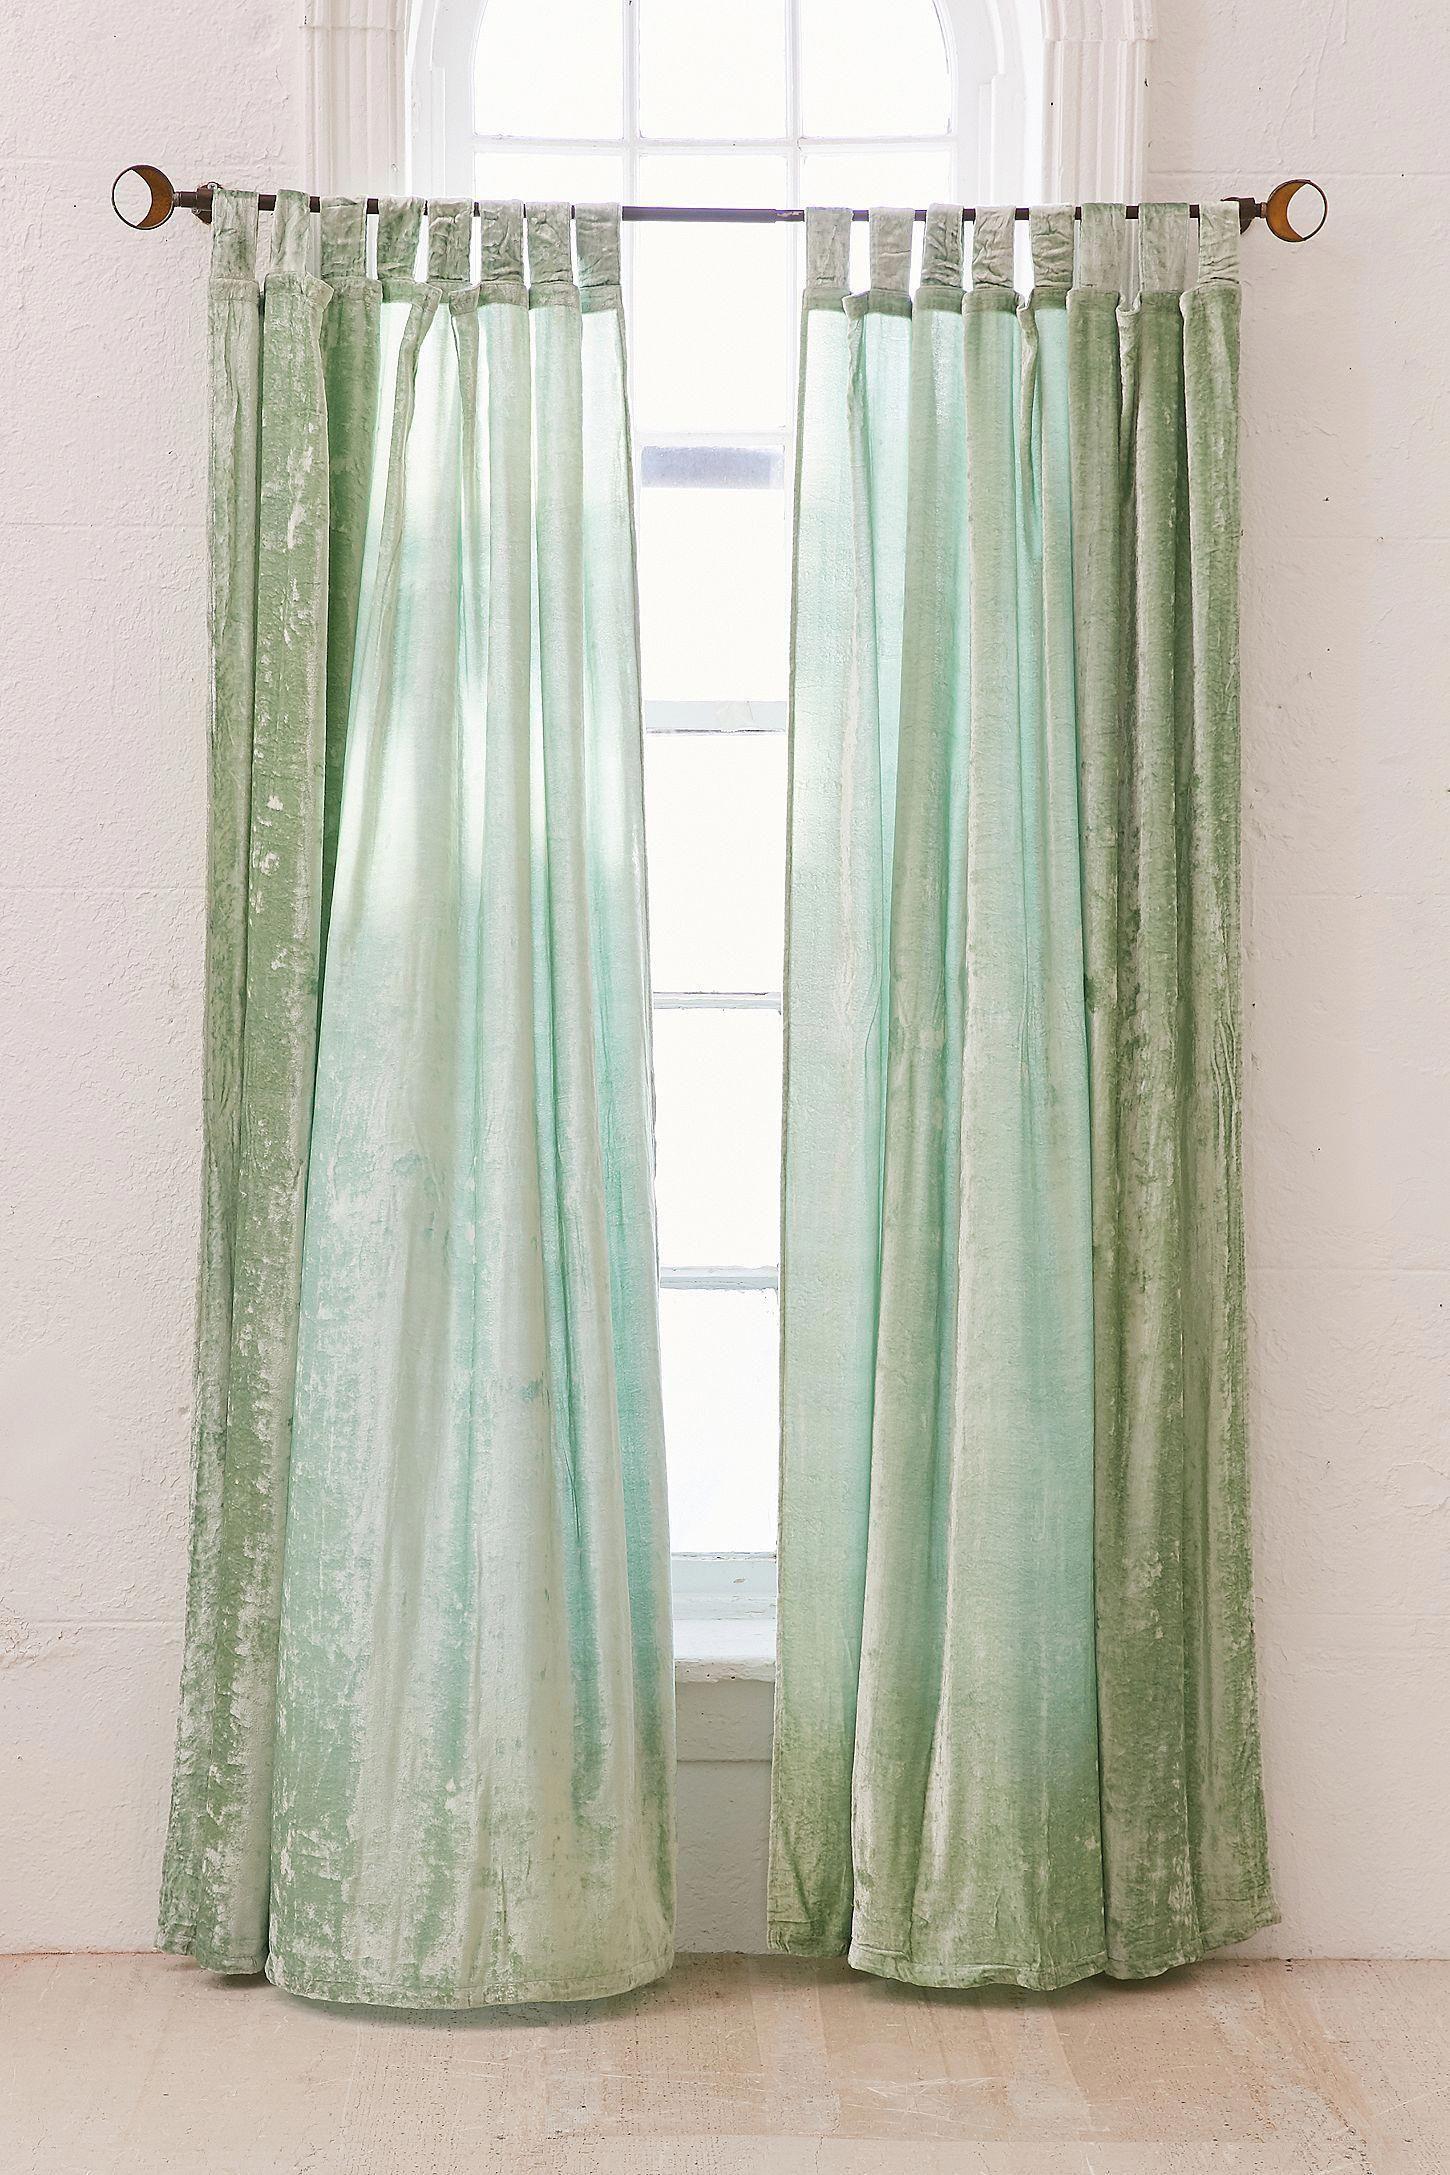 Window coverings to block sun  slide view  crushed velvet window curtain winter  winter in